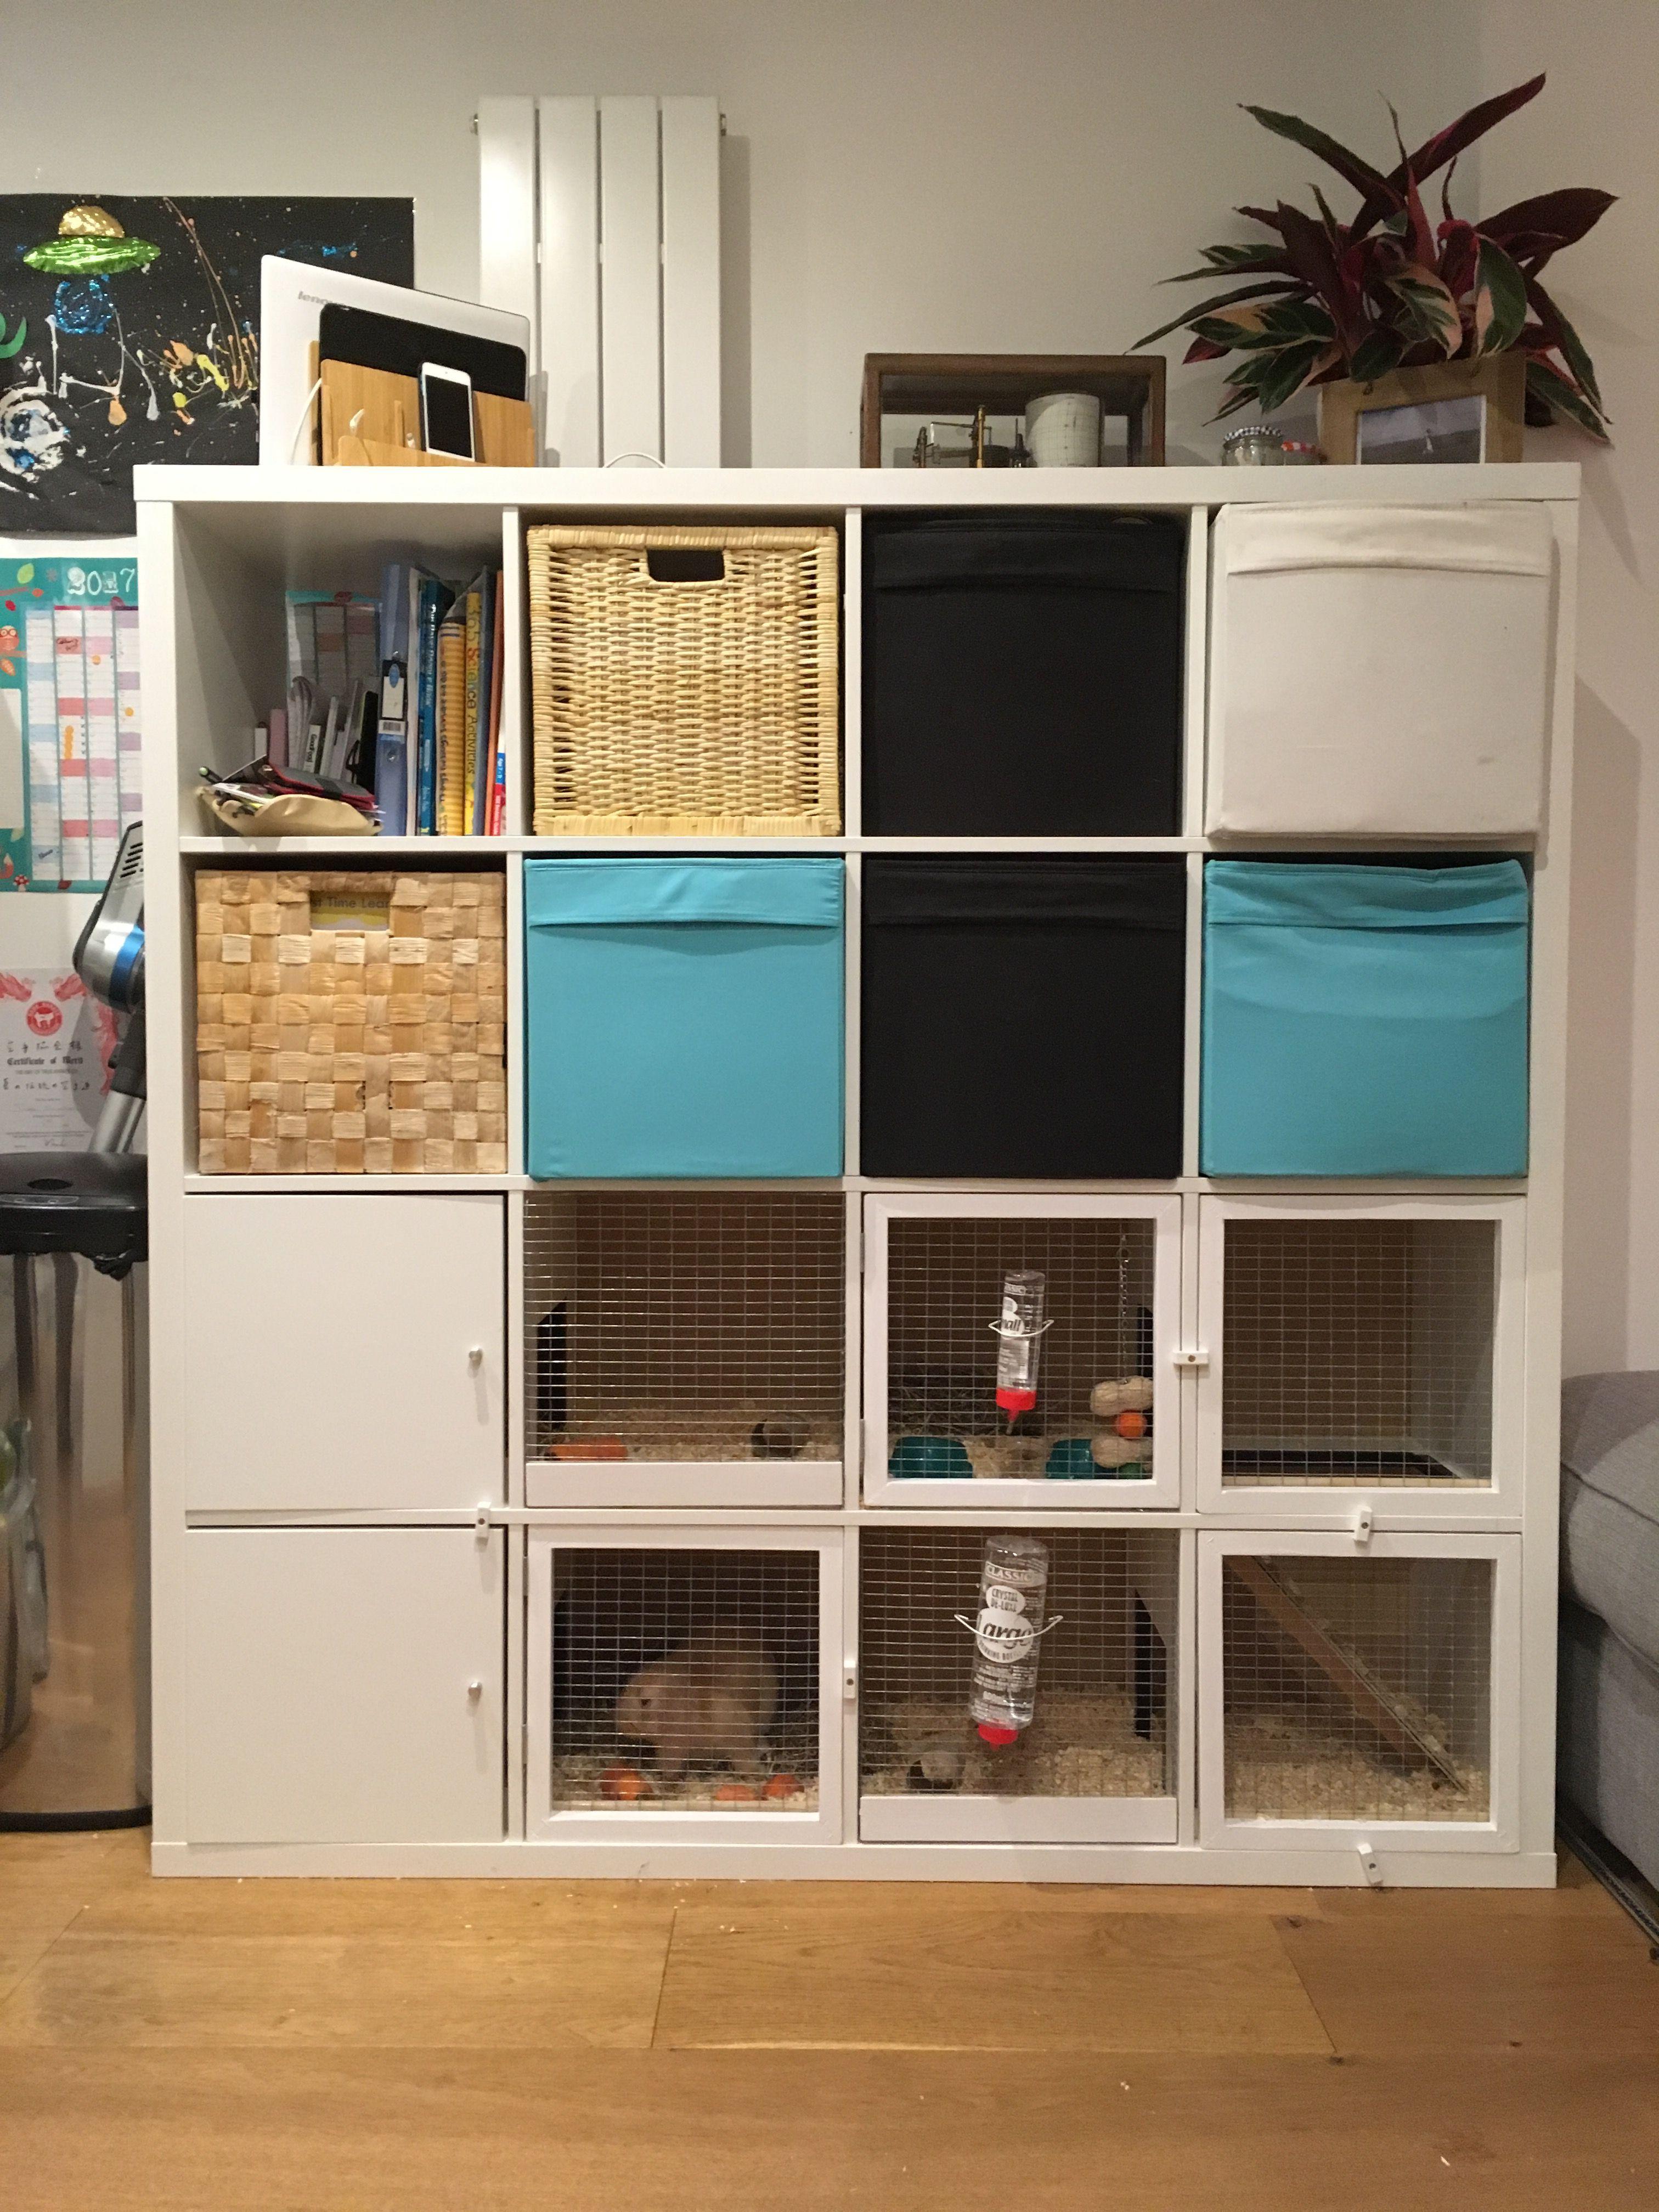 Homemade rabbit hatch ikea ikeahack ikeahacks domov